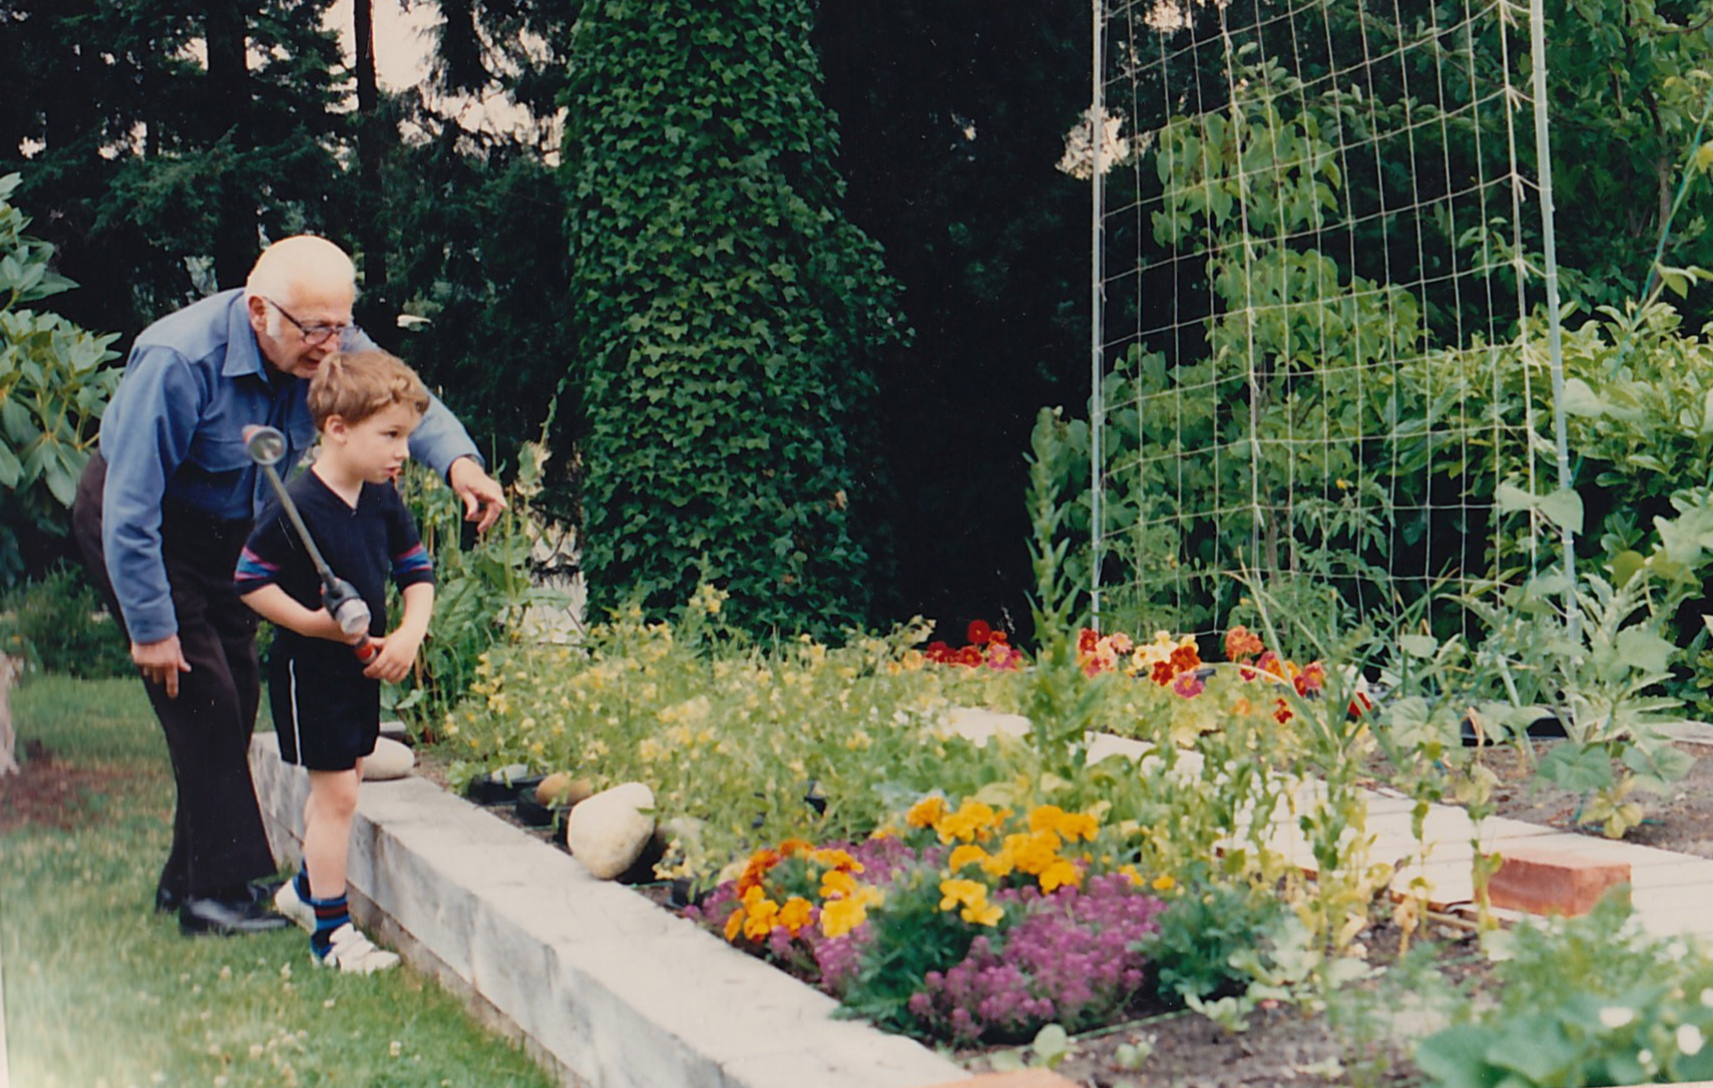 grandpa-erik-garden-of-gardening-stores-catalogs-and-hope-kinship-studies